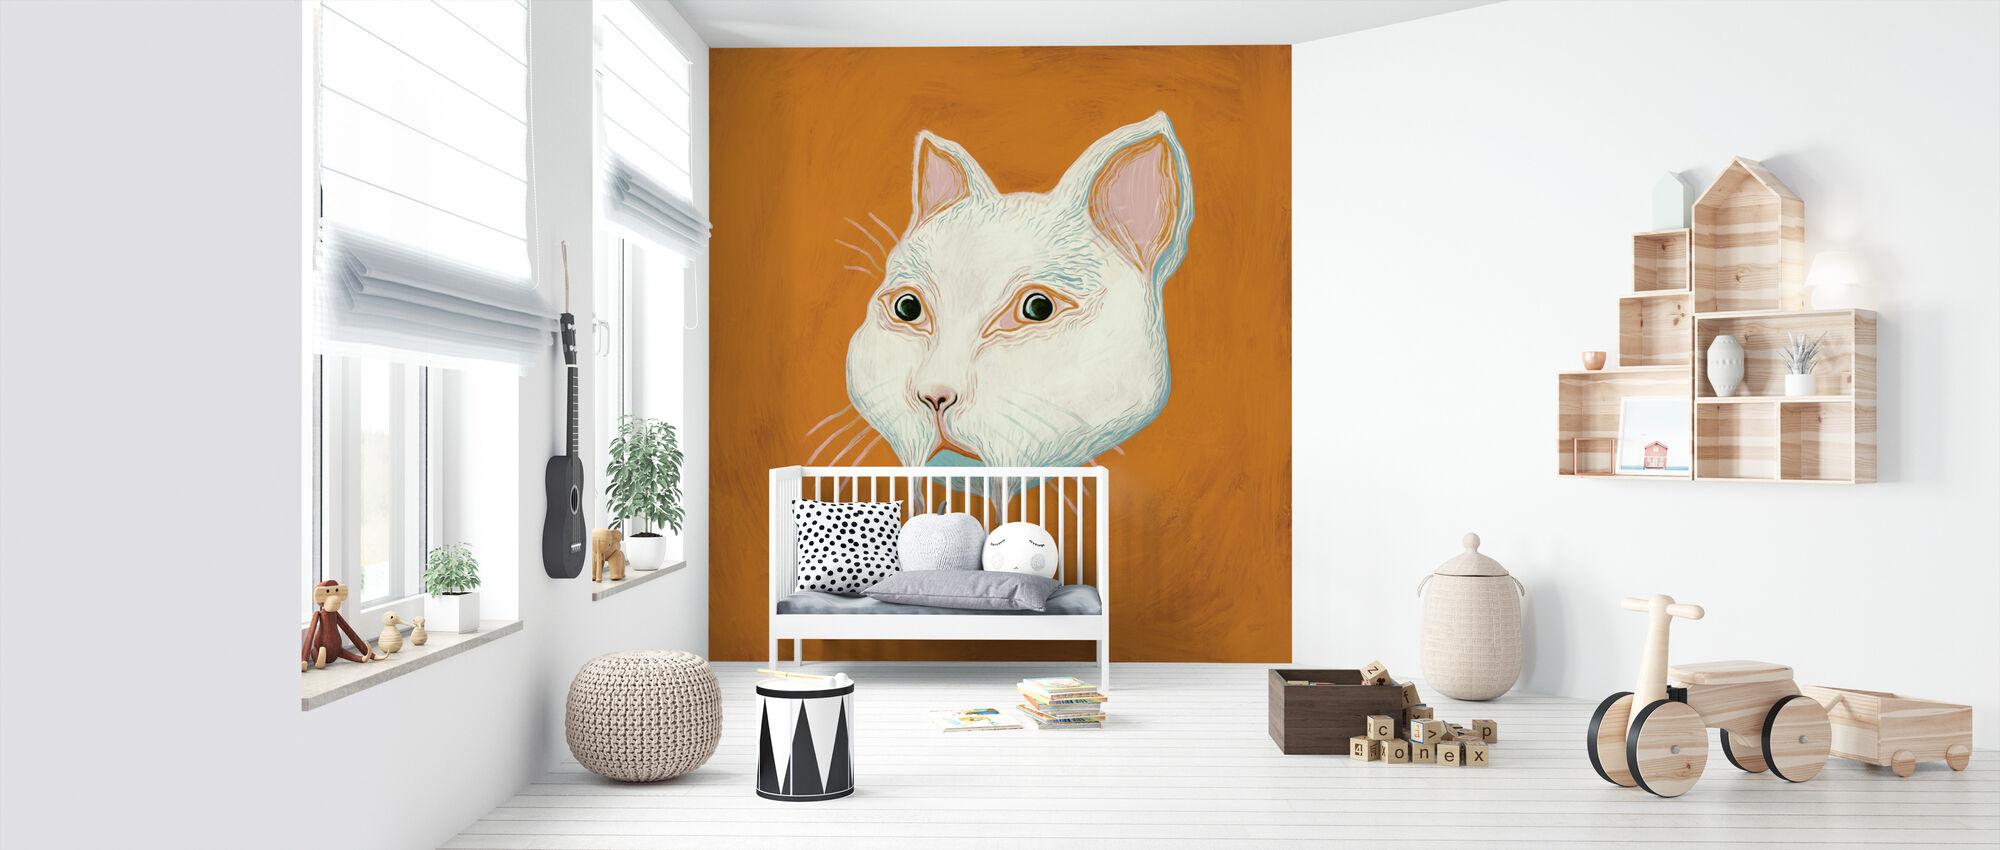 Cat - Wallpaper - Nursery